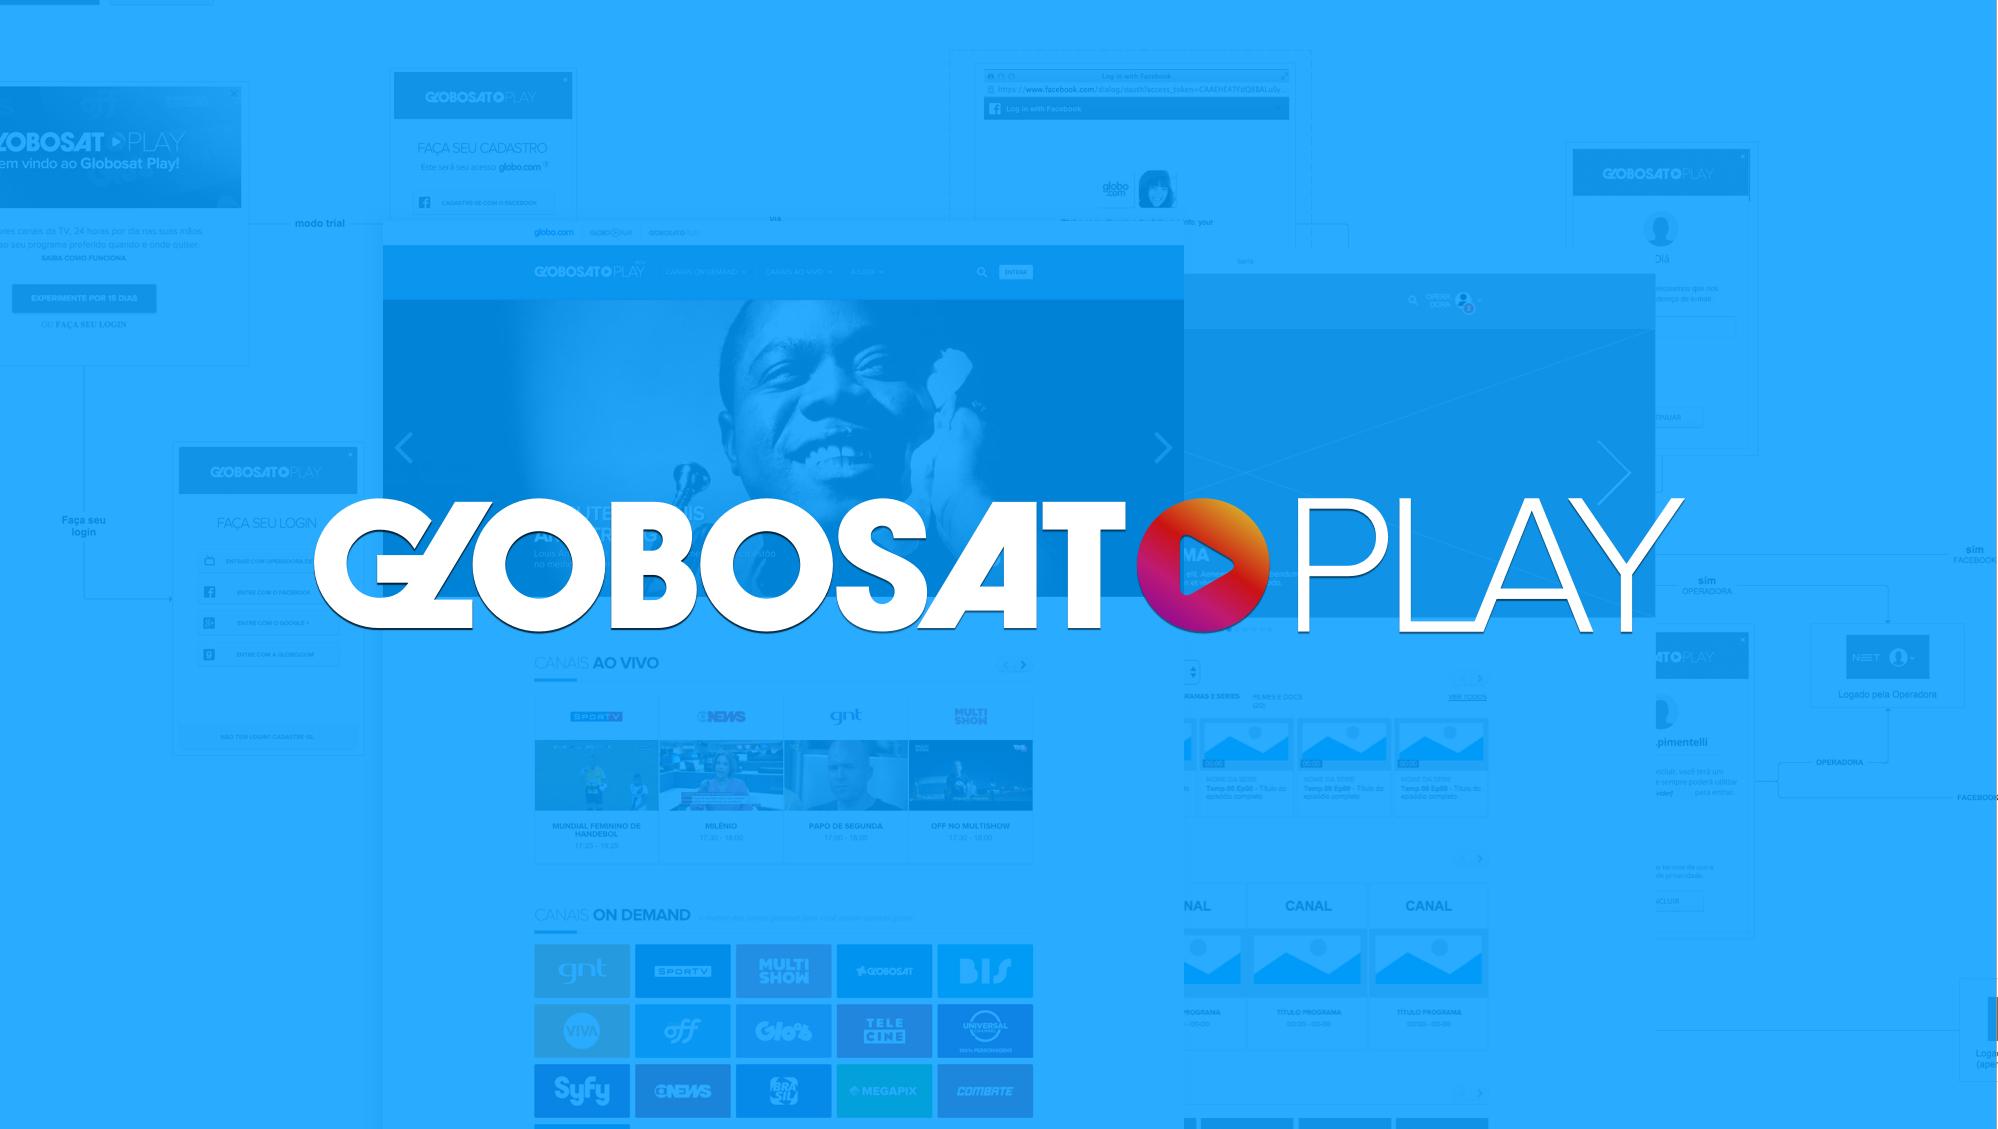 Protected: Globosat Play